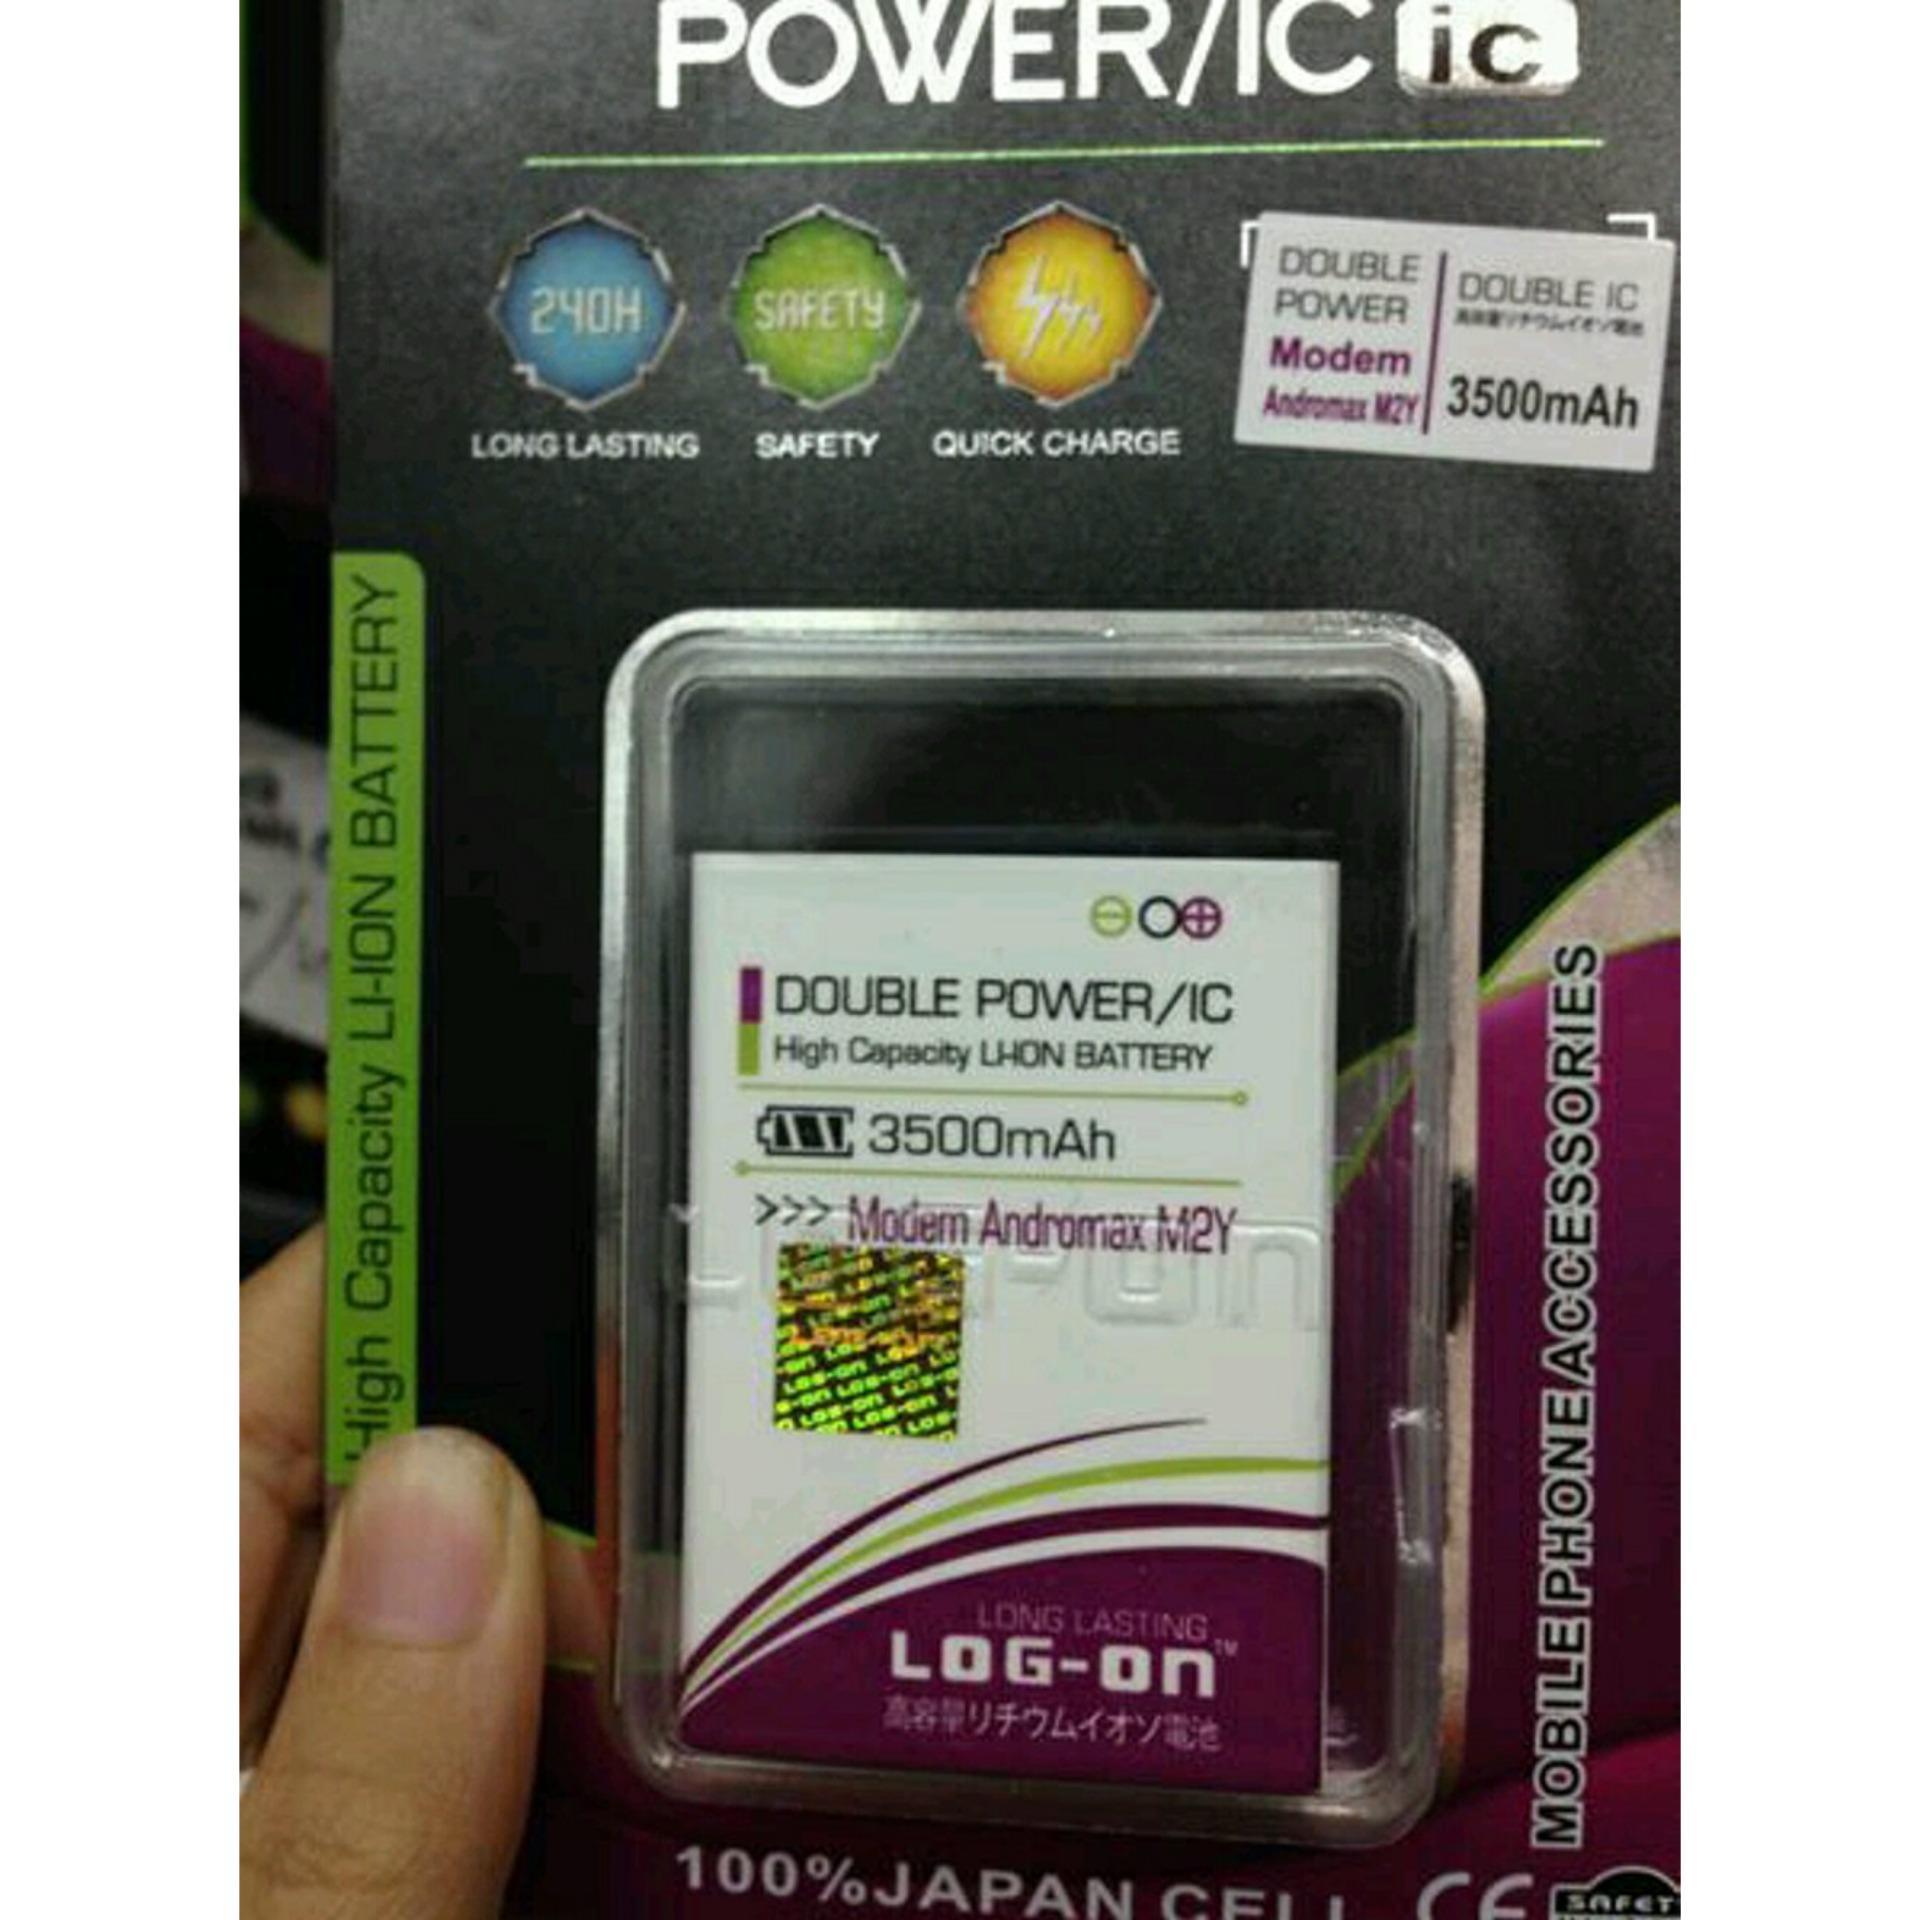 Fitur Batre Baterai Double Power Ic Log On Himax H Two M22 Dan Harga Advan S5 E Pro Putih Andromax M2y Modem